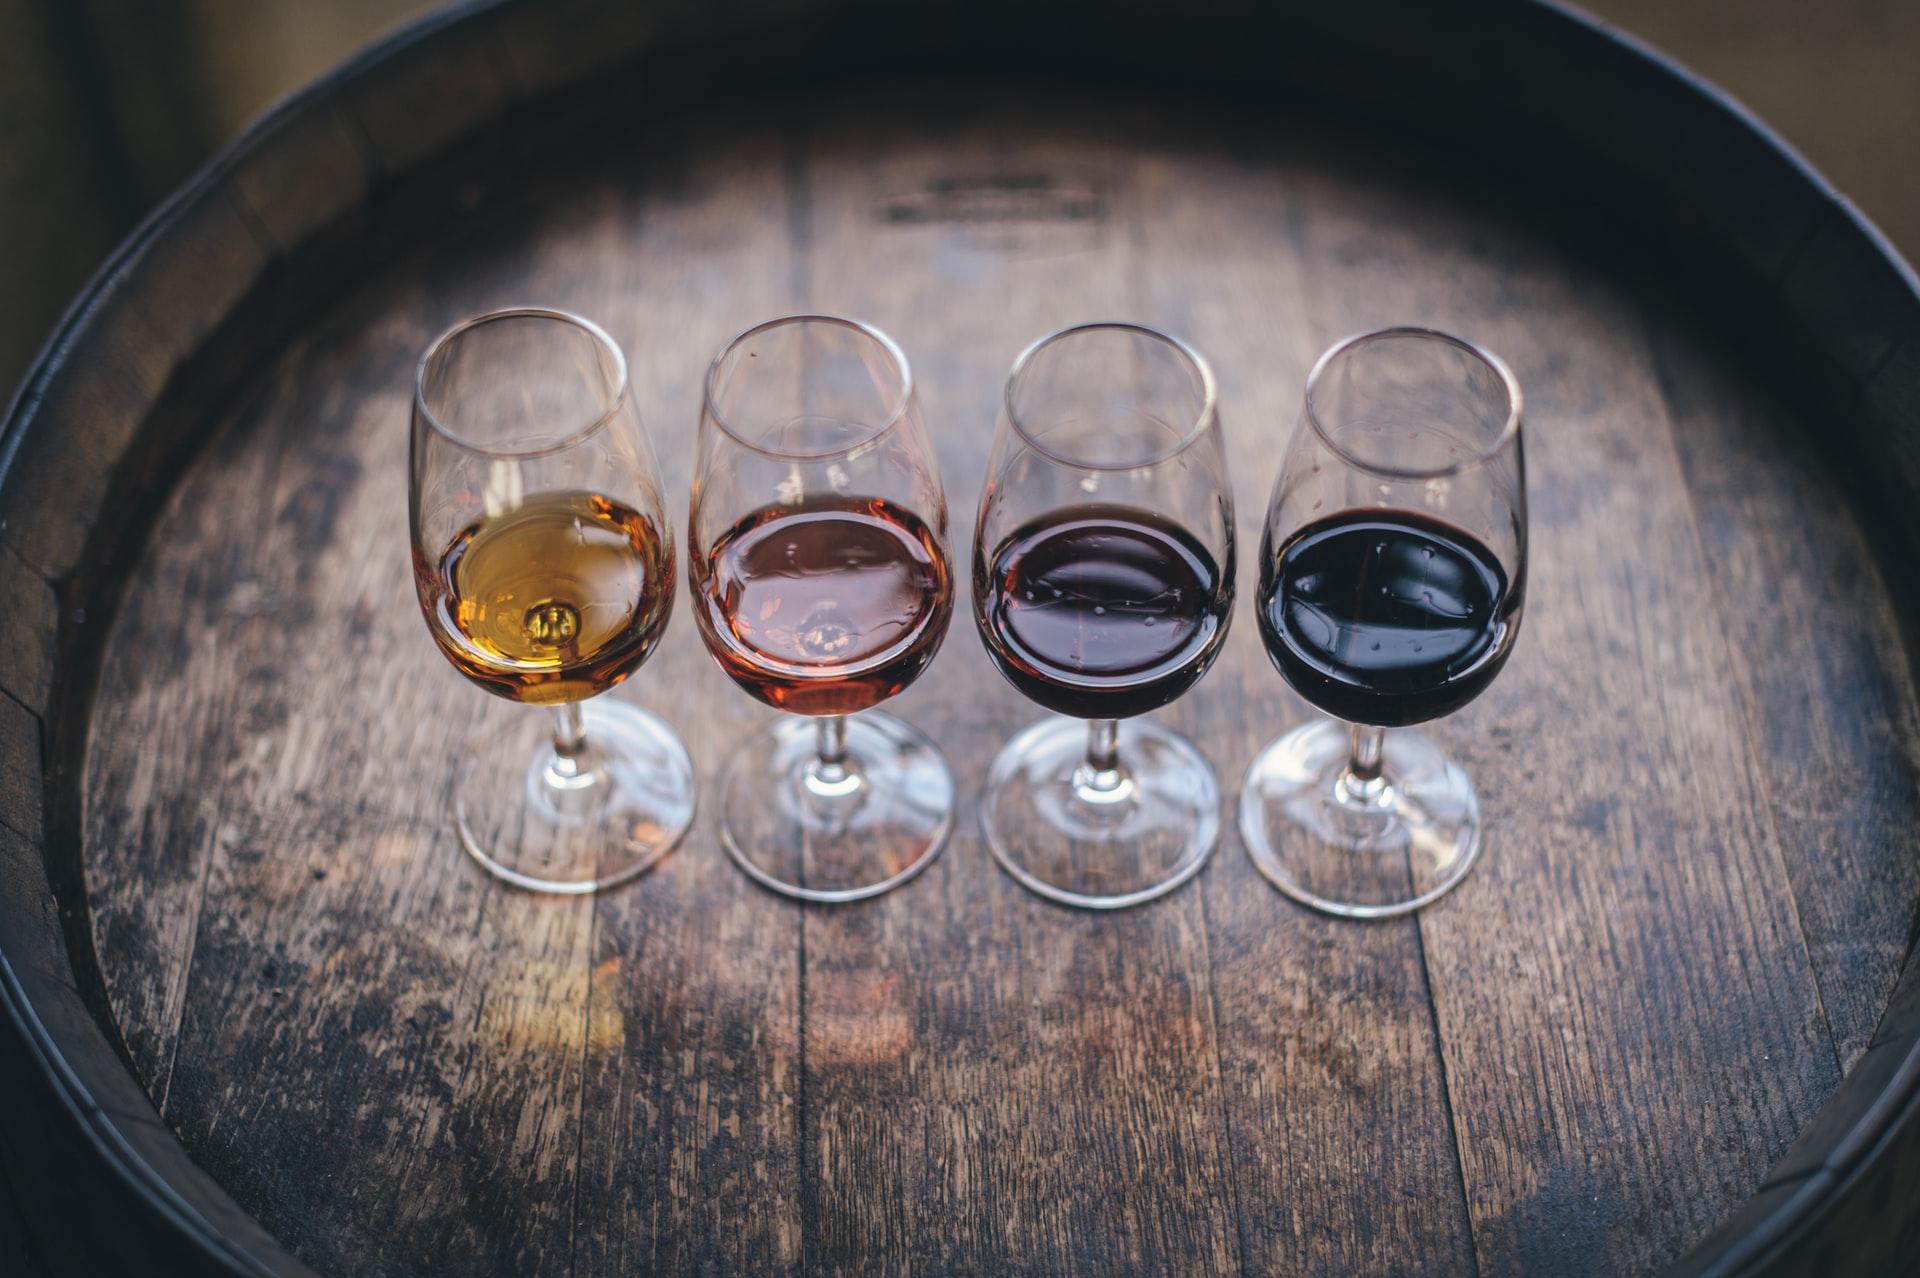 Toulouse: Tres vinotecas de visita obligada